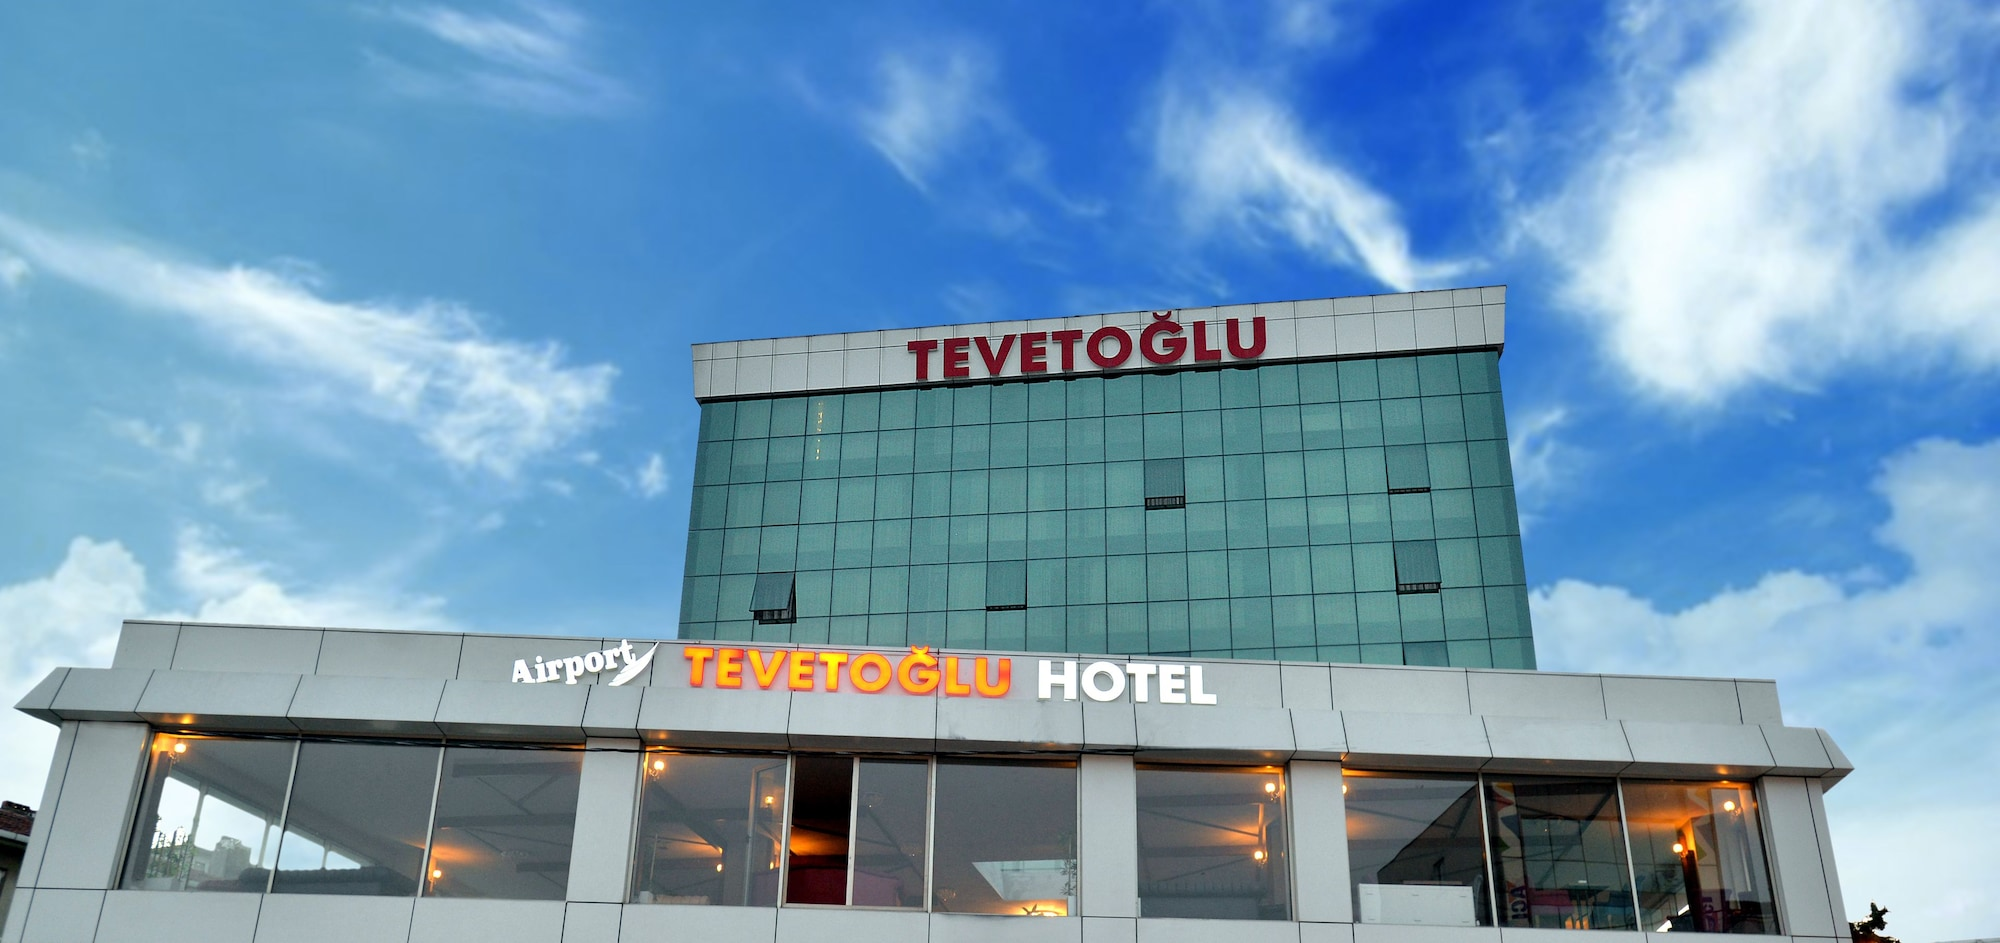 Tevetoglu Hotel, Tuzla